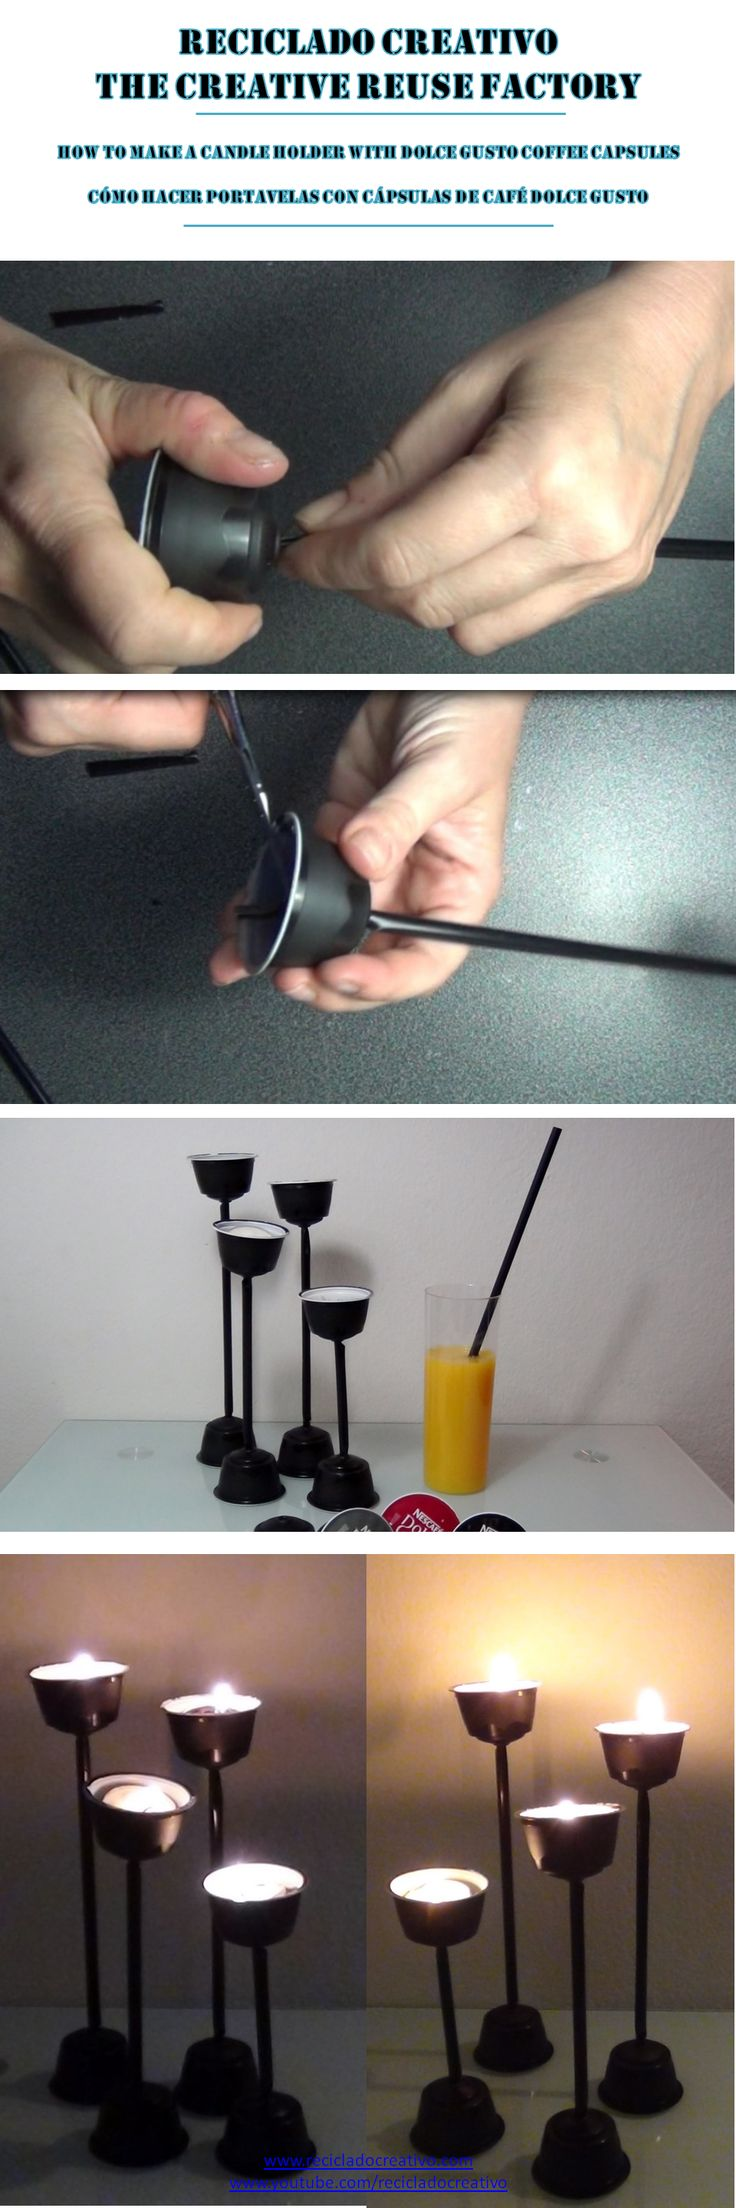 Cómo hacer un portavelas con cápsulas de café - How to make a candleholder with Dolce Gusto Coffee capsules -  https://youtu.be/CBcJkwWesRU?list=PLemyWmGdwuSMBtpBAu9BUgsnwqDEdaTda https://www.youtube.com/watch?v=CBcJkwWesRU